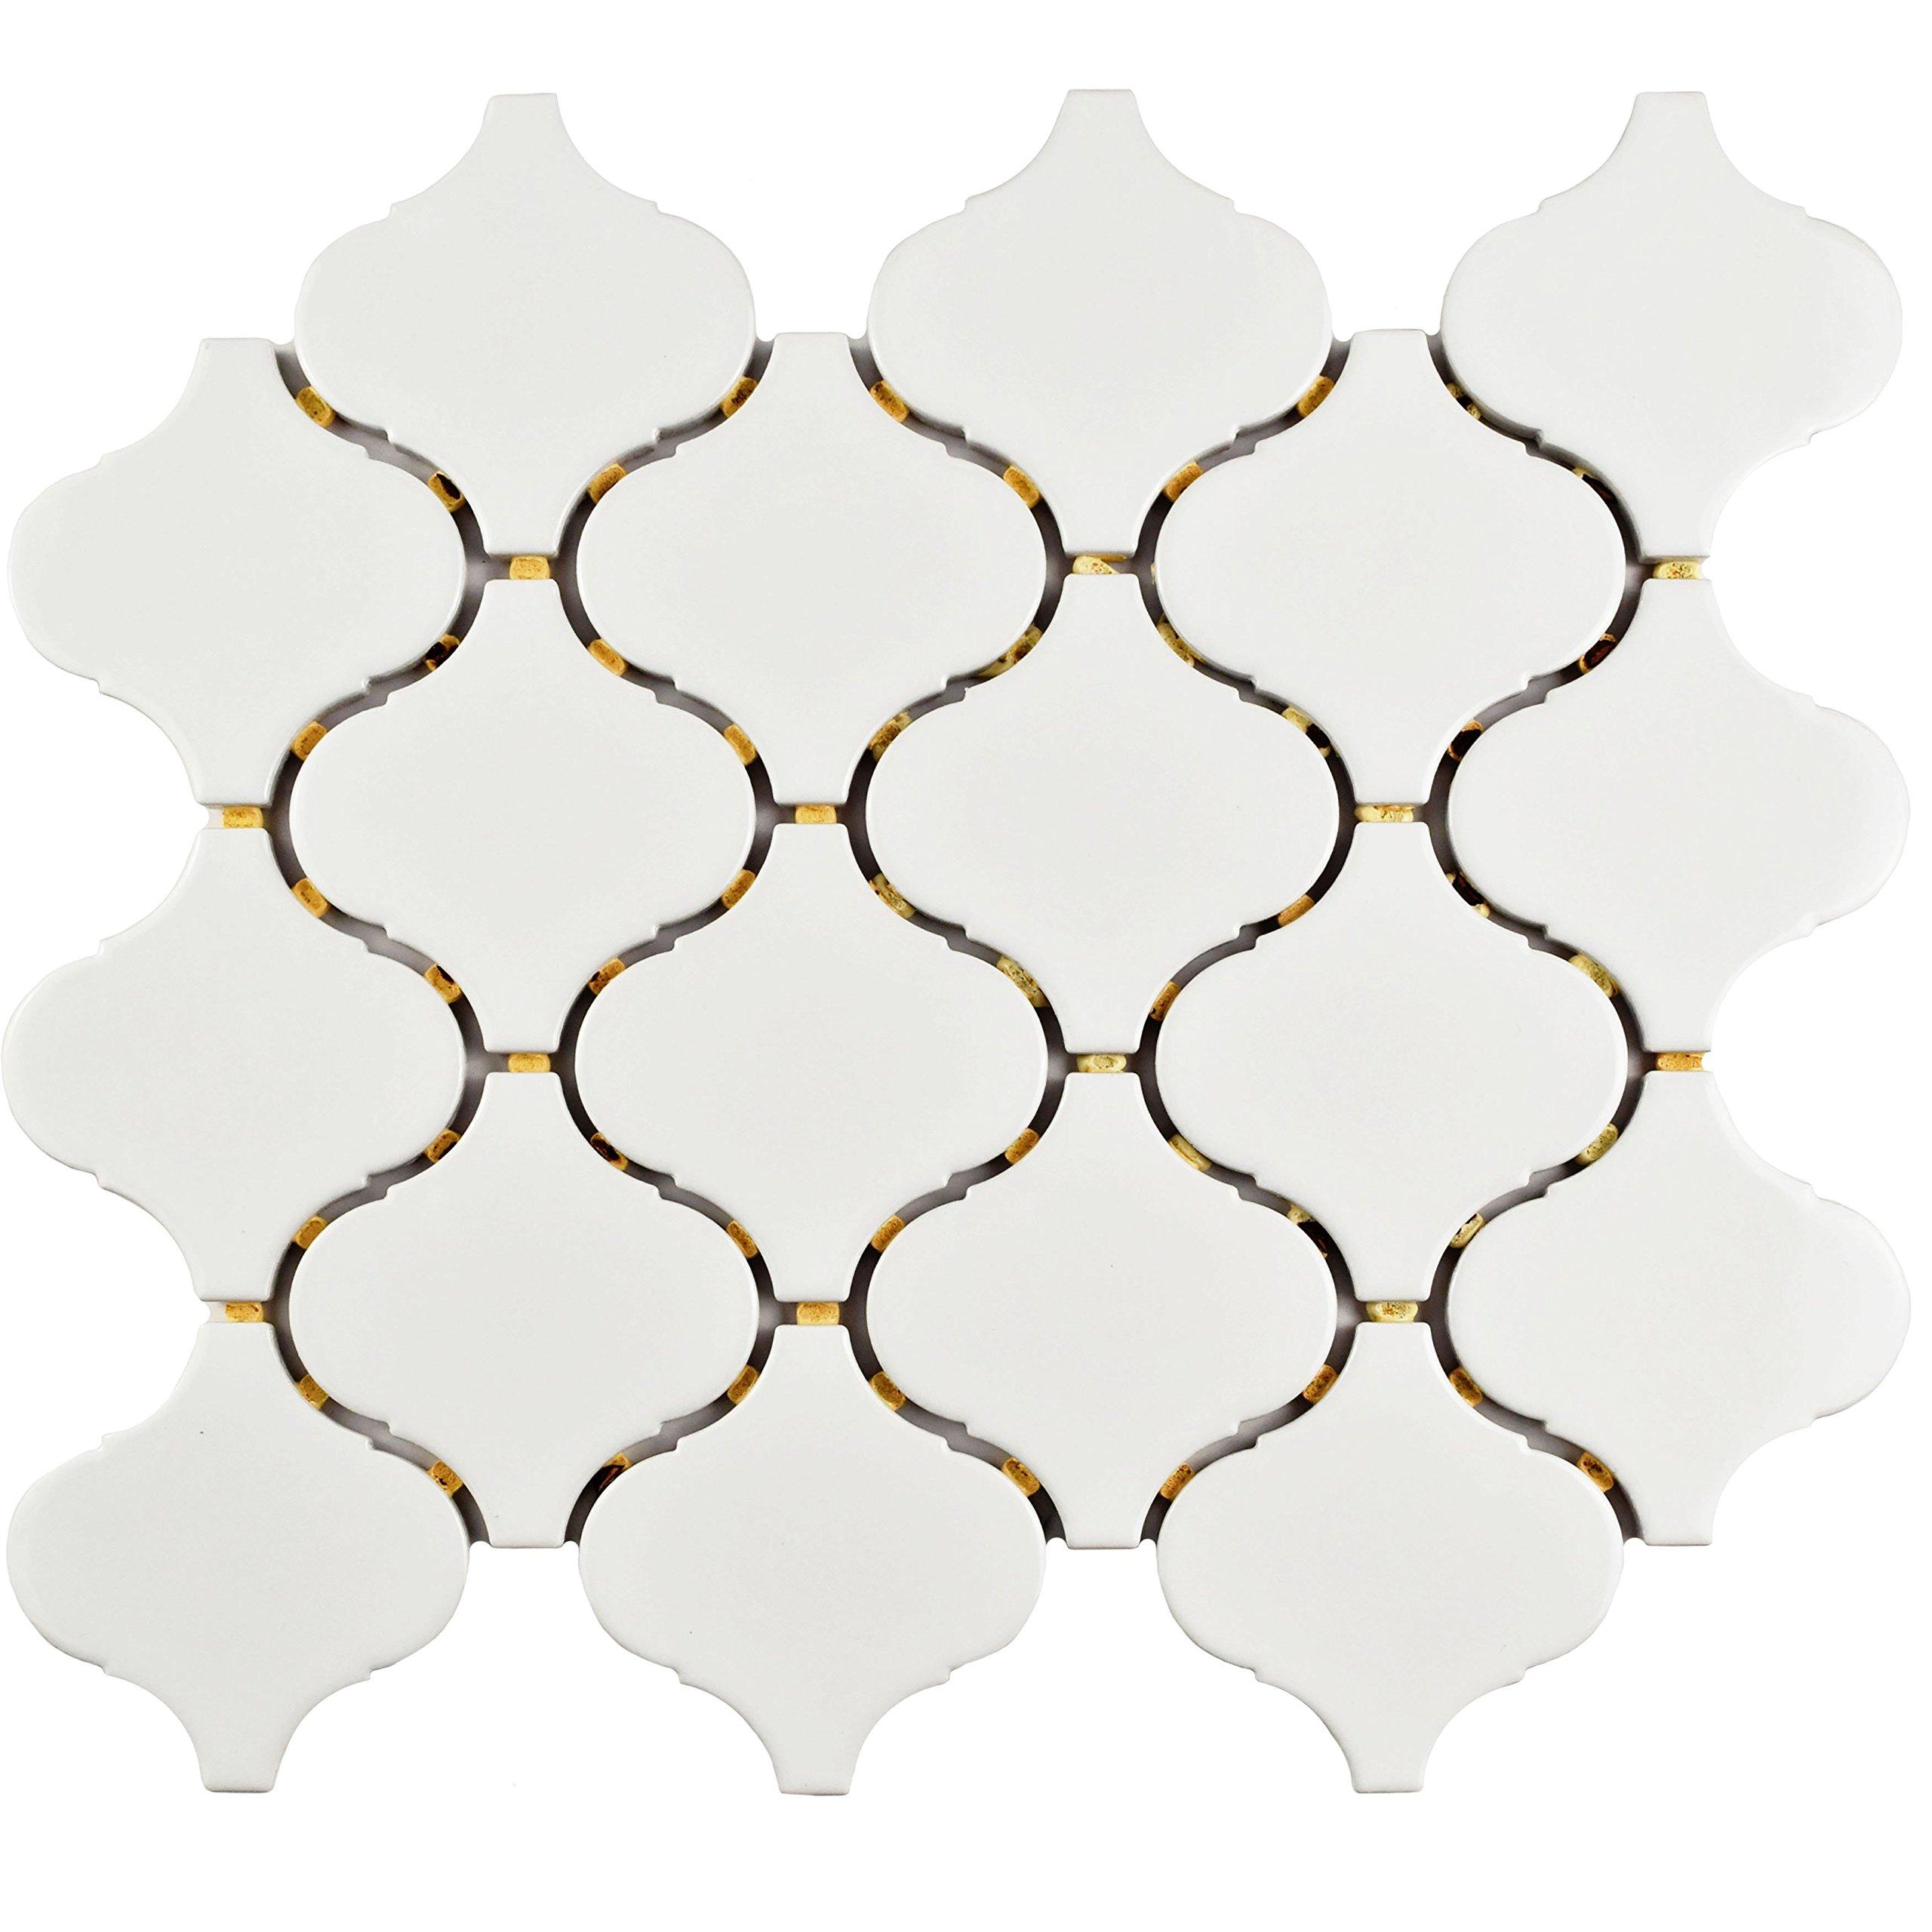 SomerTile FMALTGW Deriba Lantern Porcelain Mosaic Floor and Wall Tile, 9.5'' x 10.75'', Glossy White